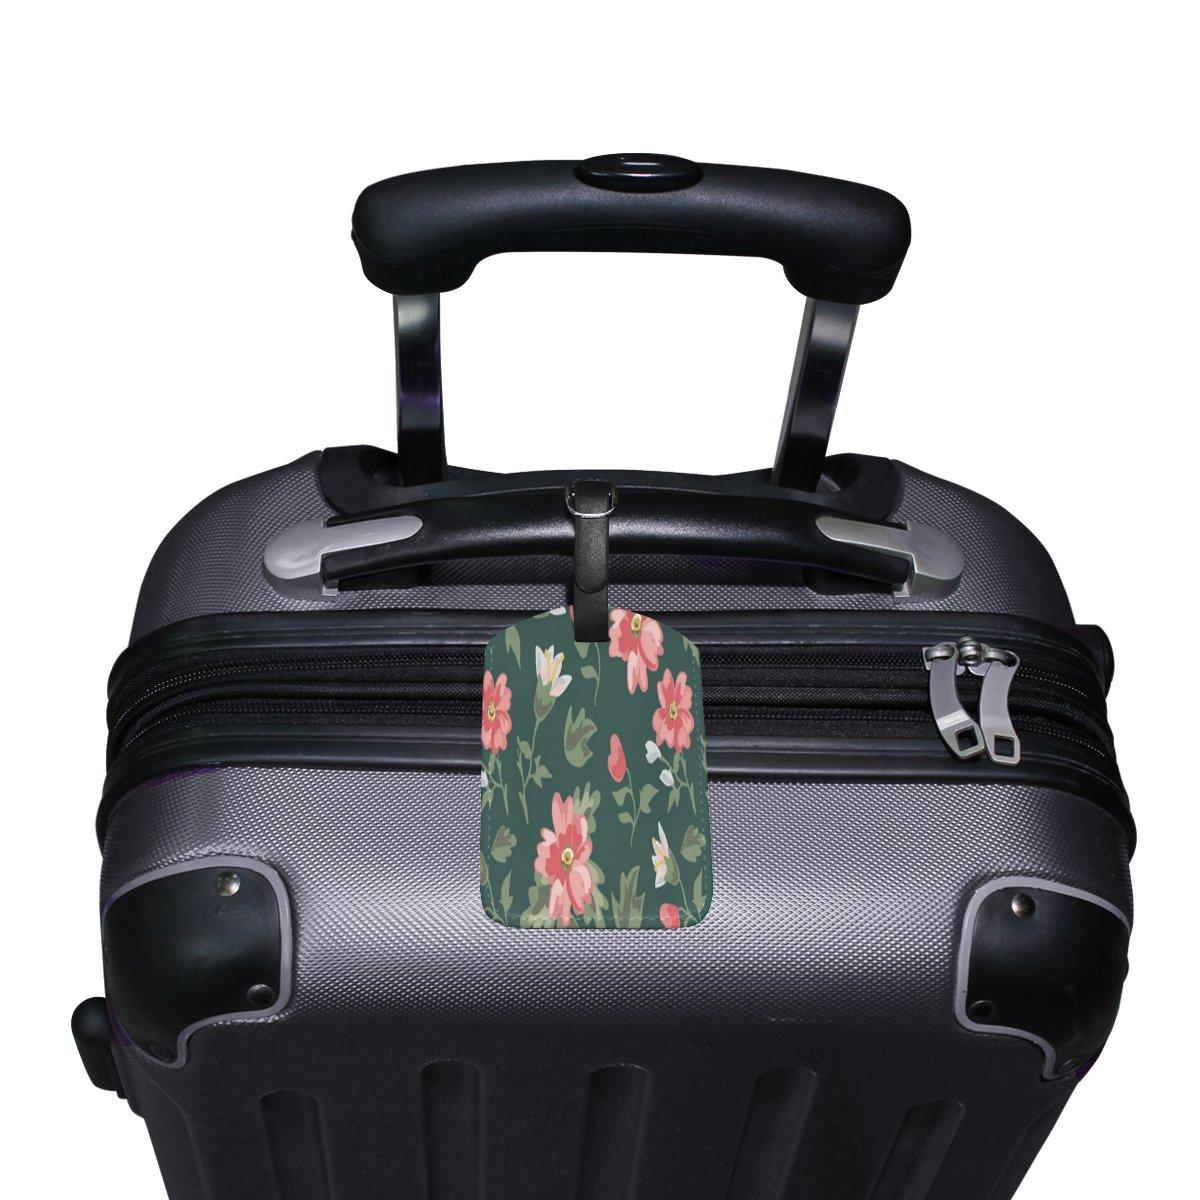 Saobao Travel Luggage Tag European Floral PU Leather Baggage Travel ID